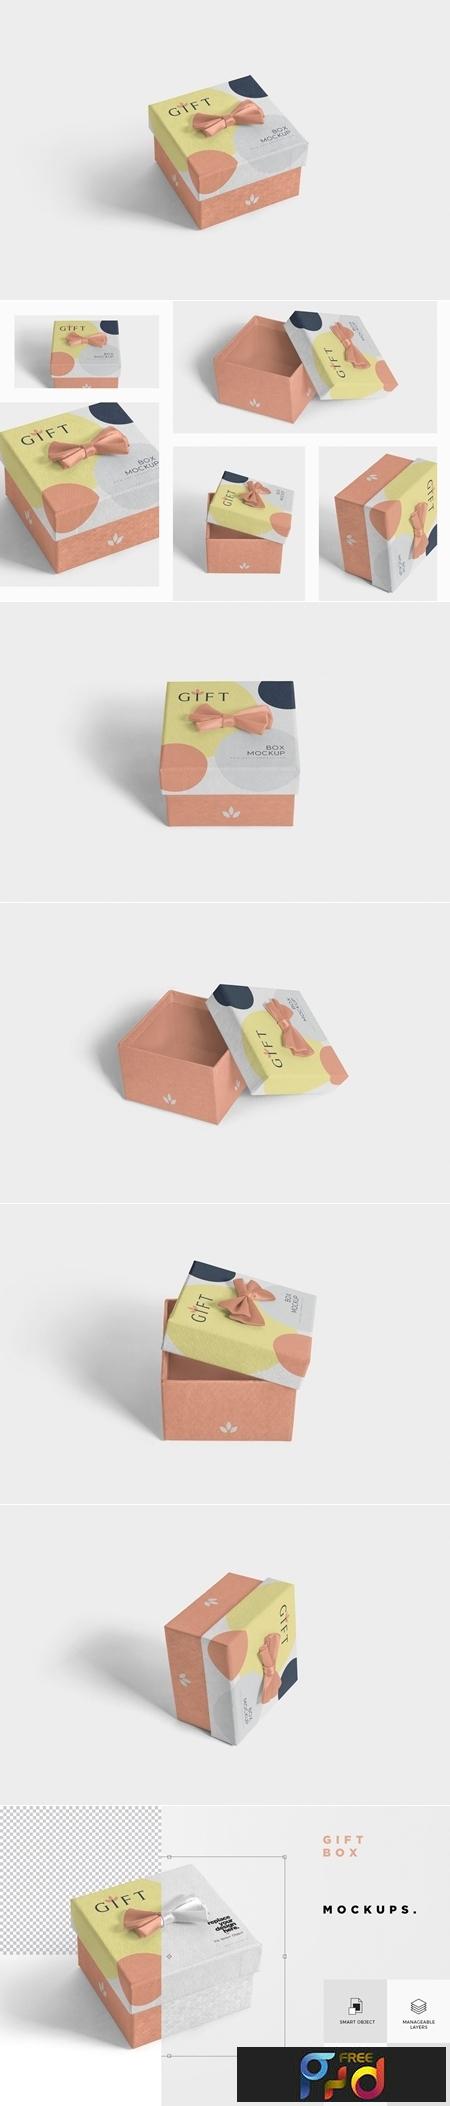 Square Gift Box Mockups 3476232 1